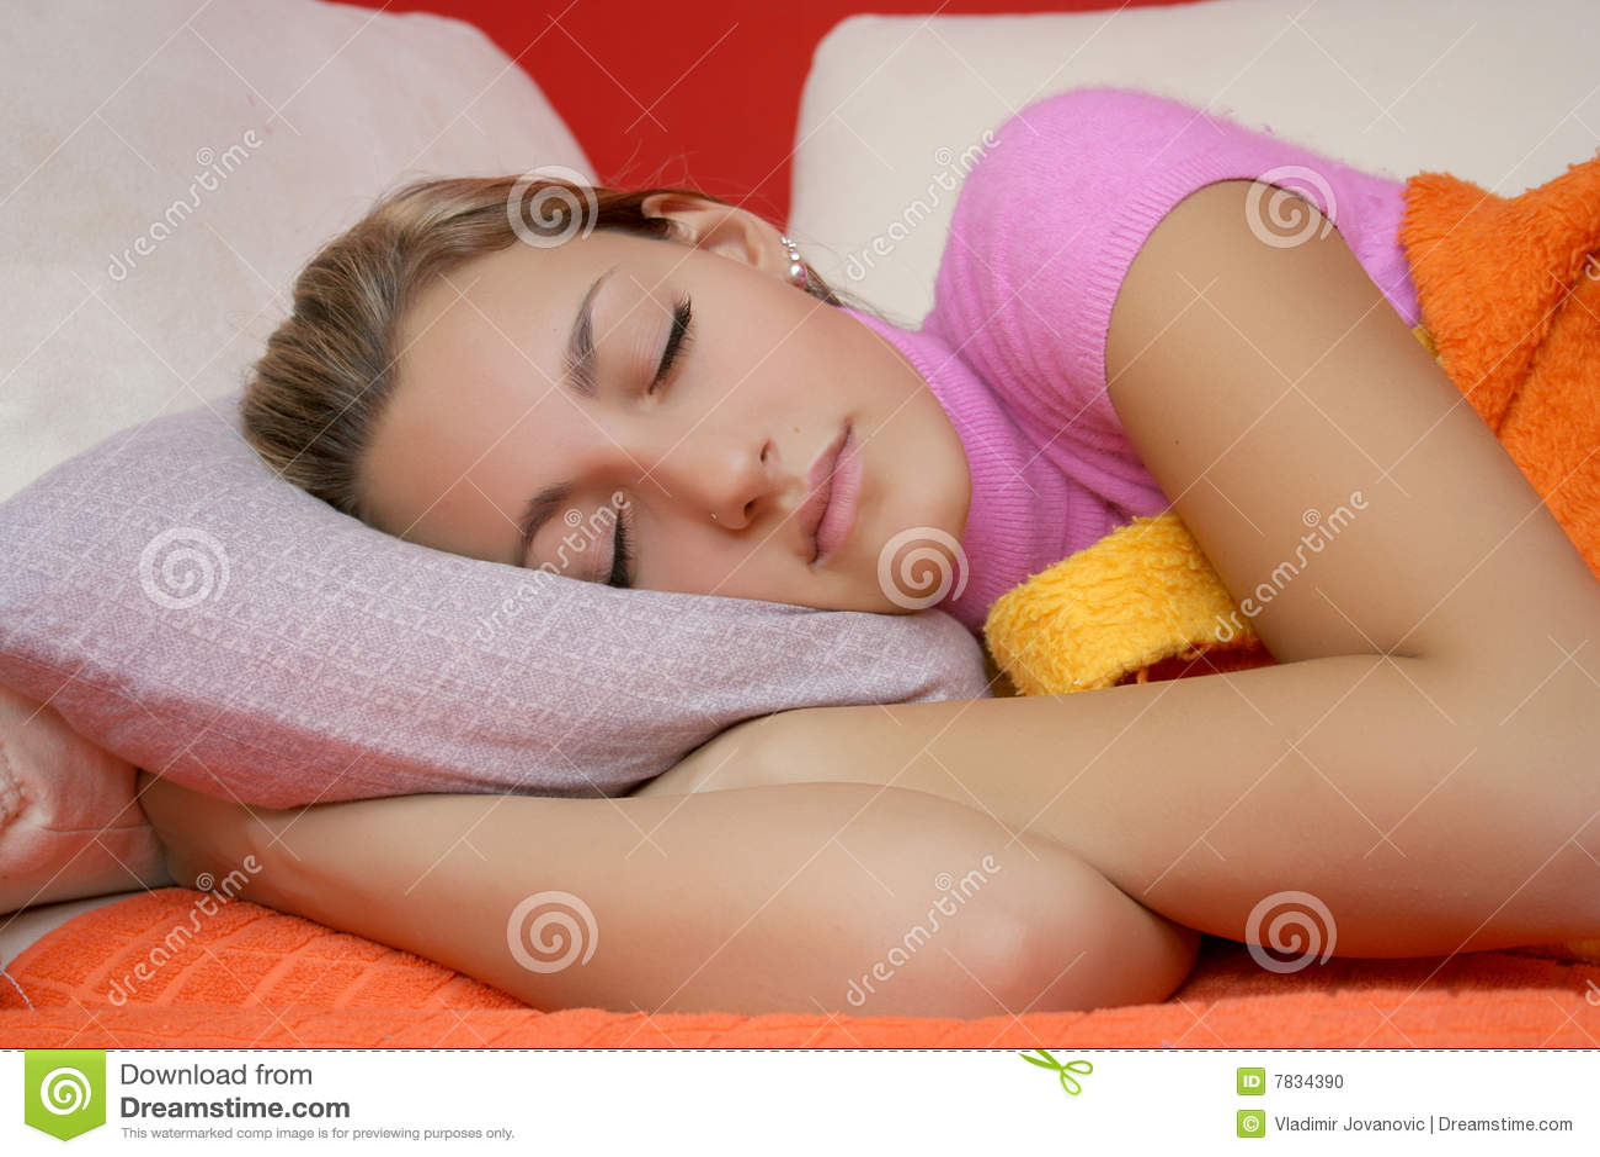 Site Map Sleeping Teen 118